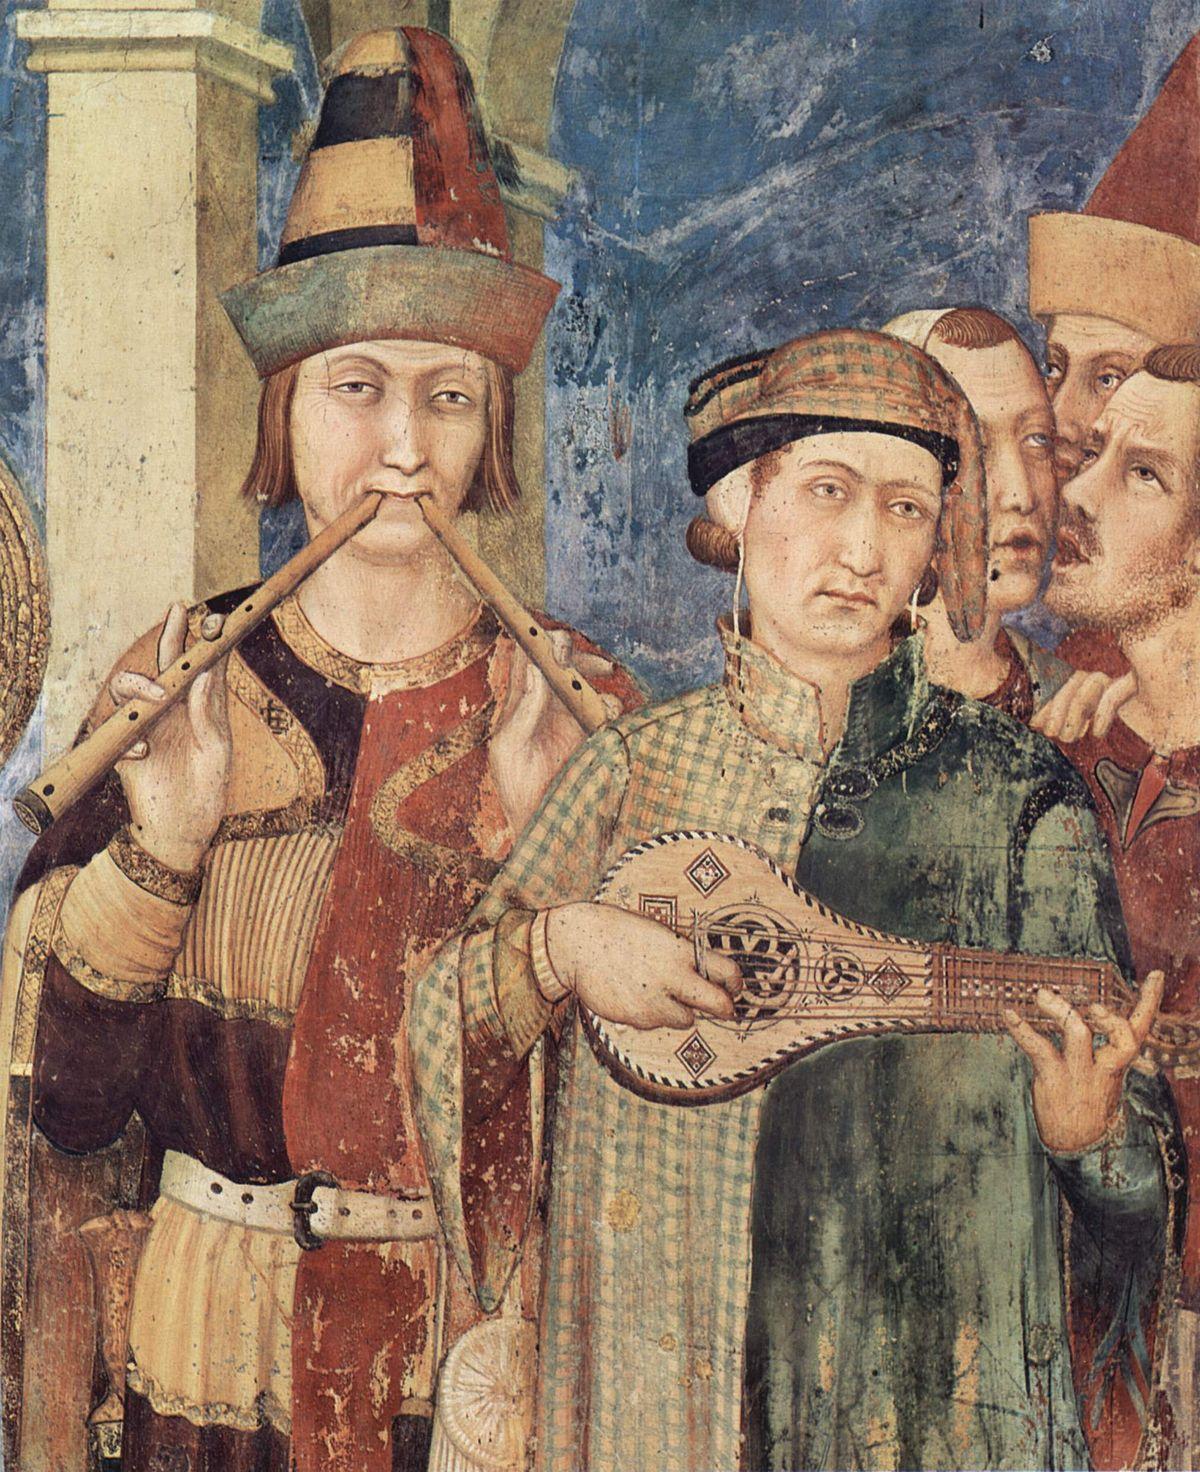 Menestrelli, giullari, musici vaganti – Festival del Medioevo